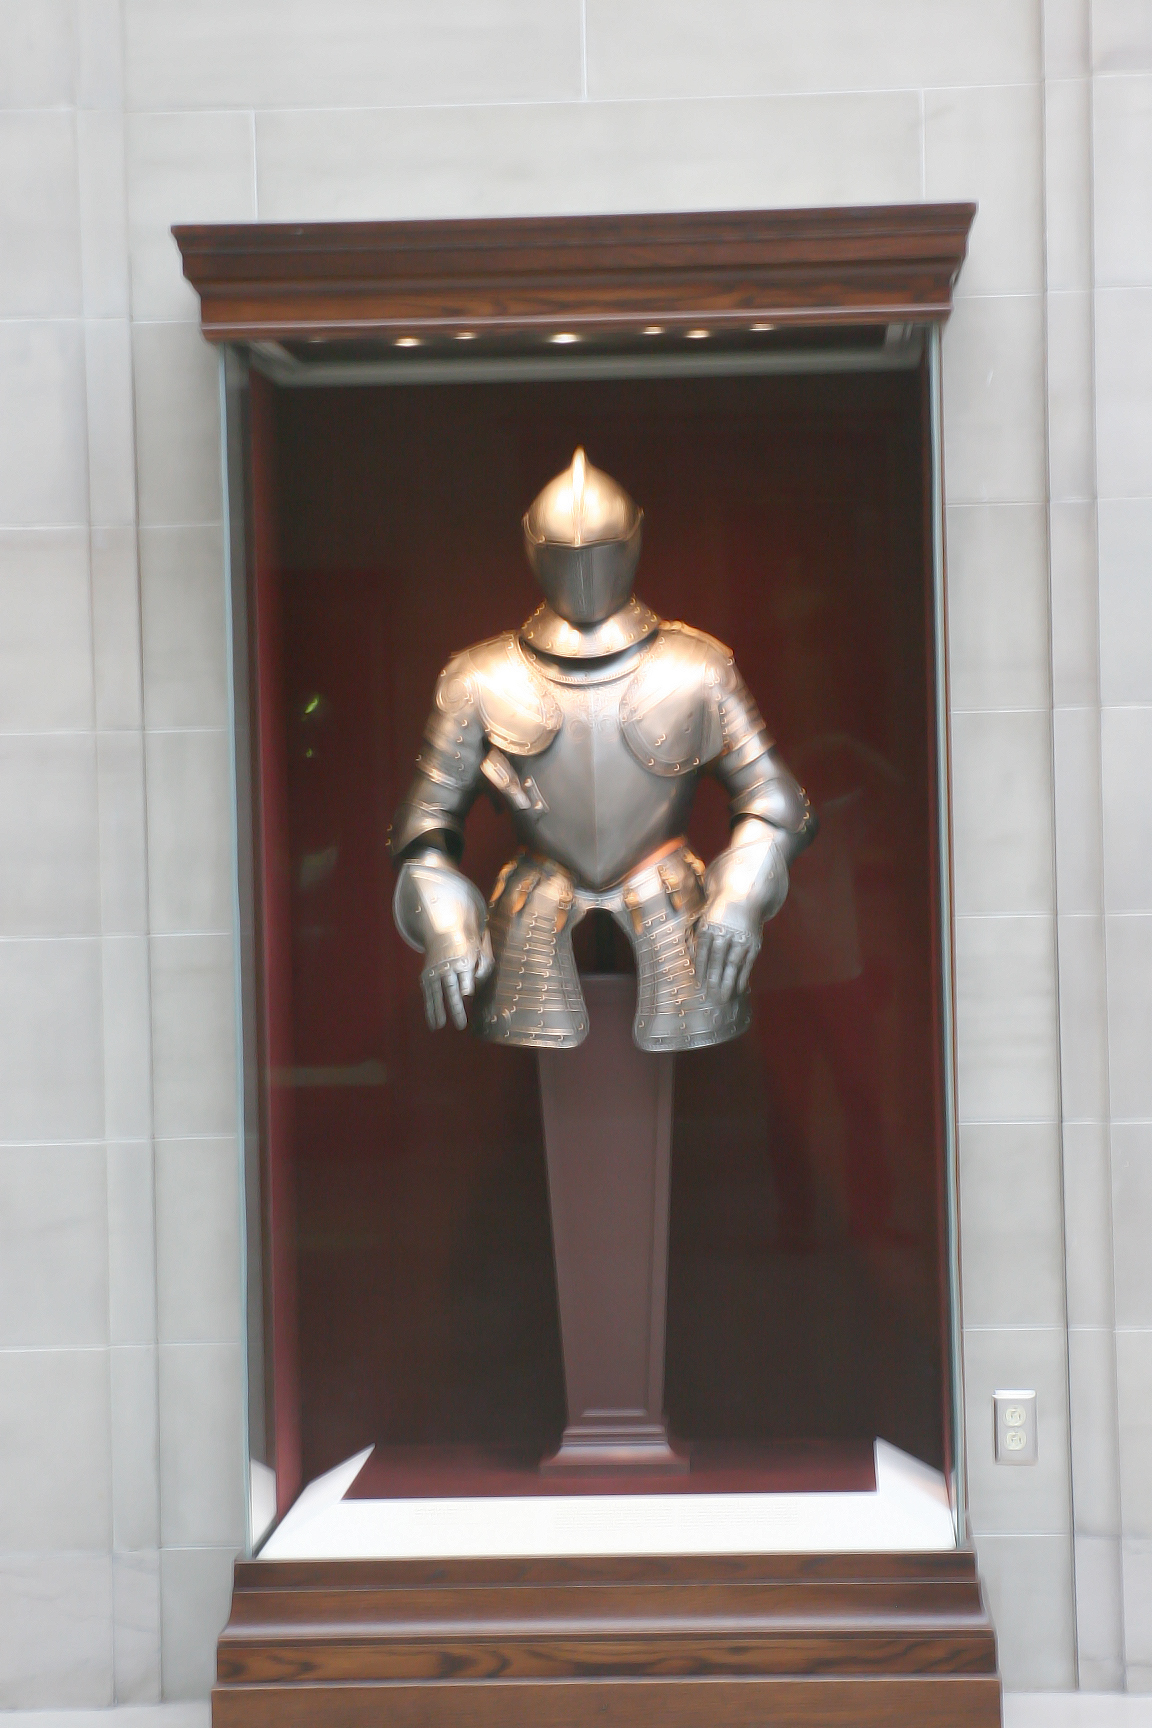 Warrior wear display